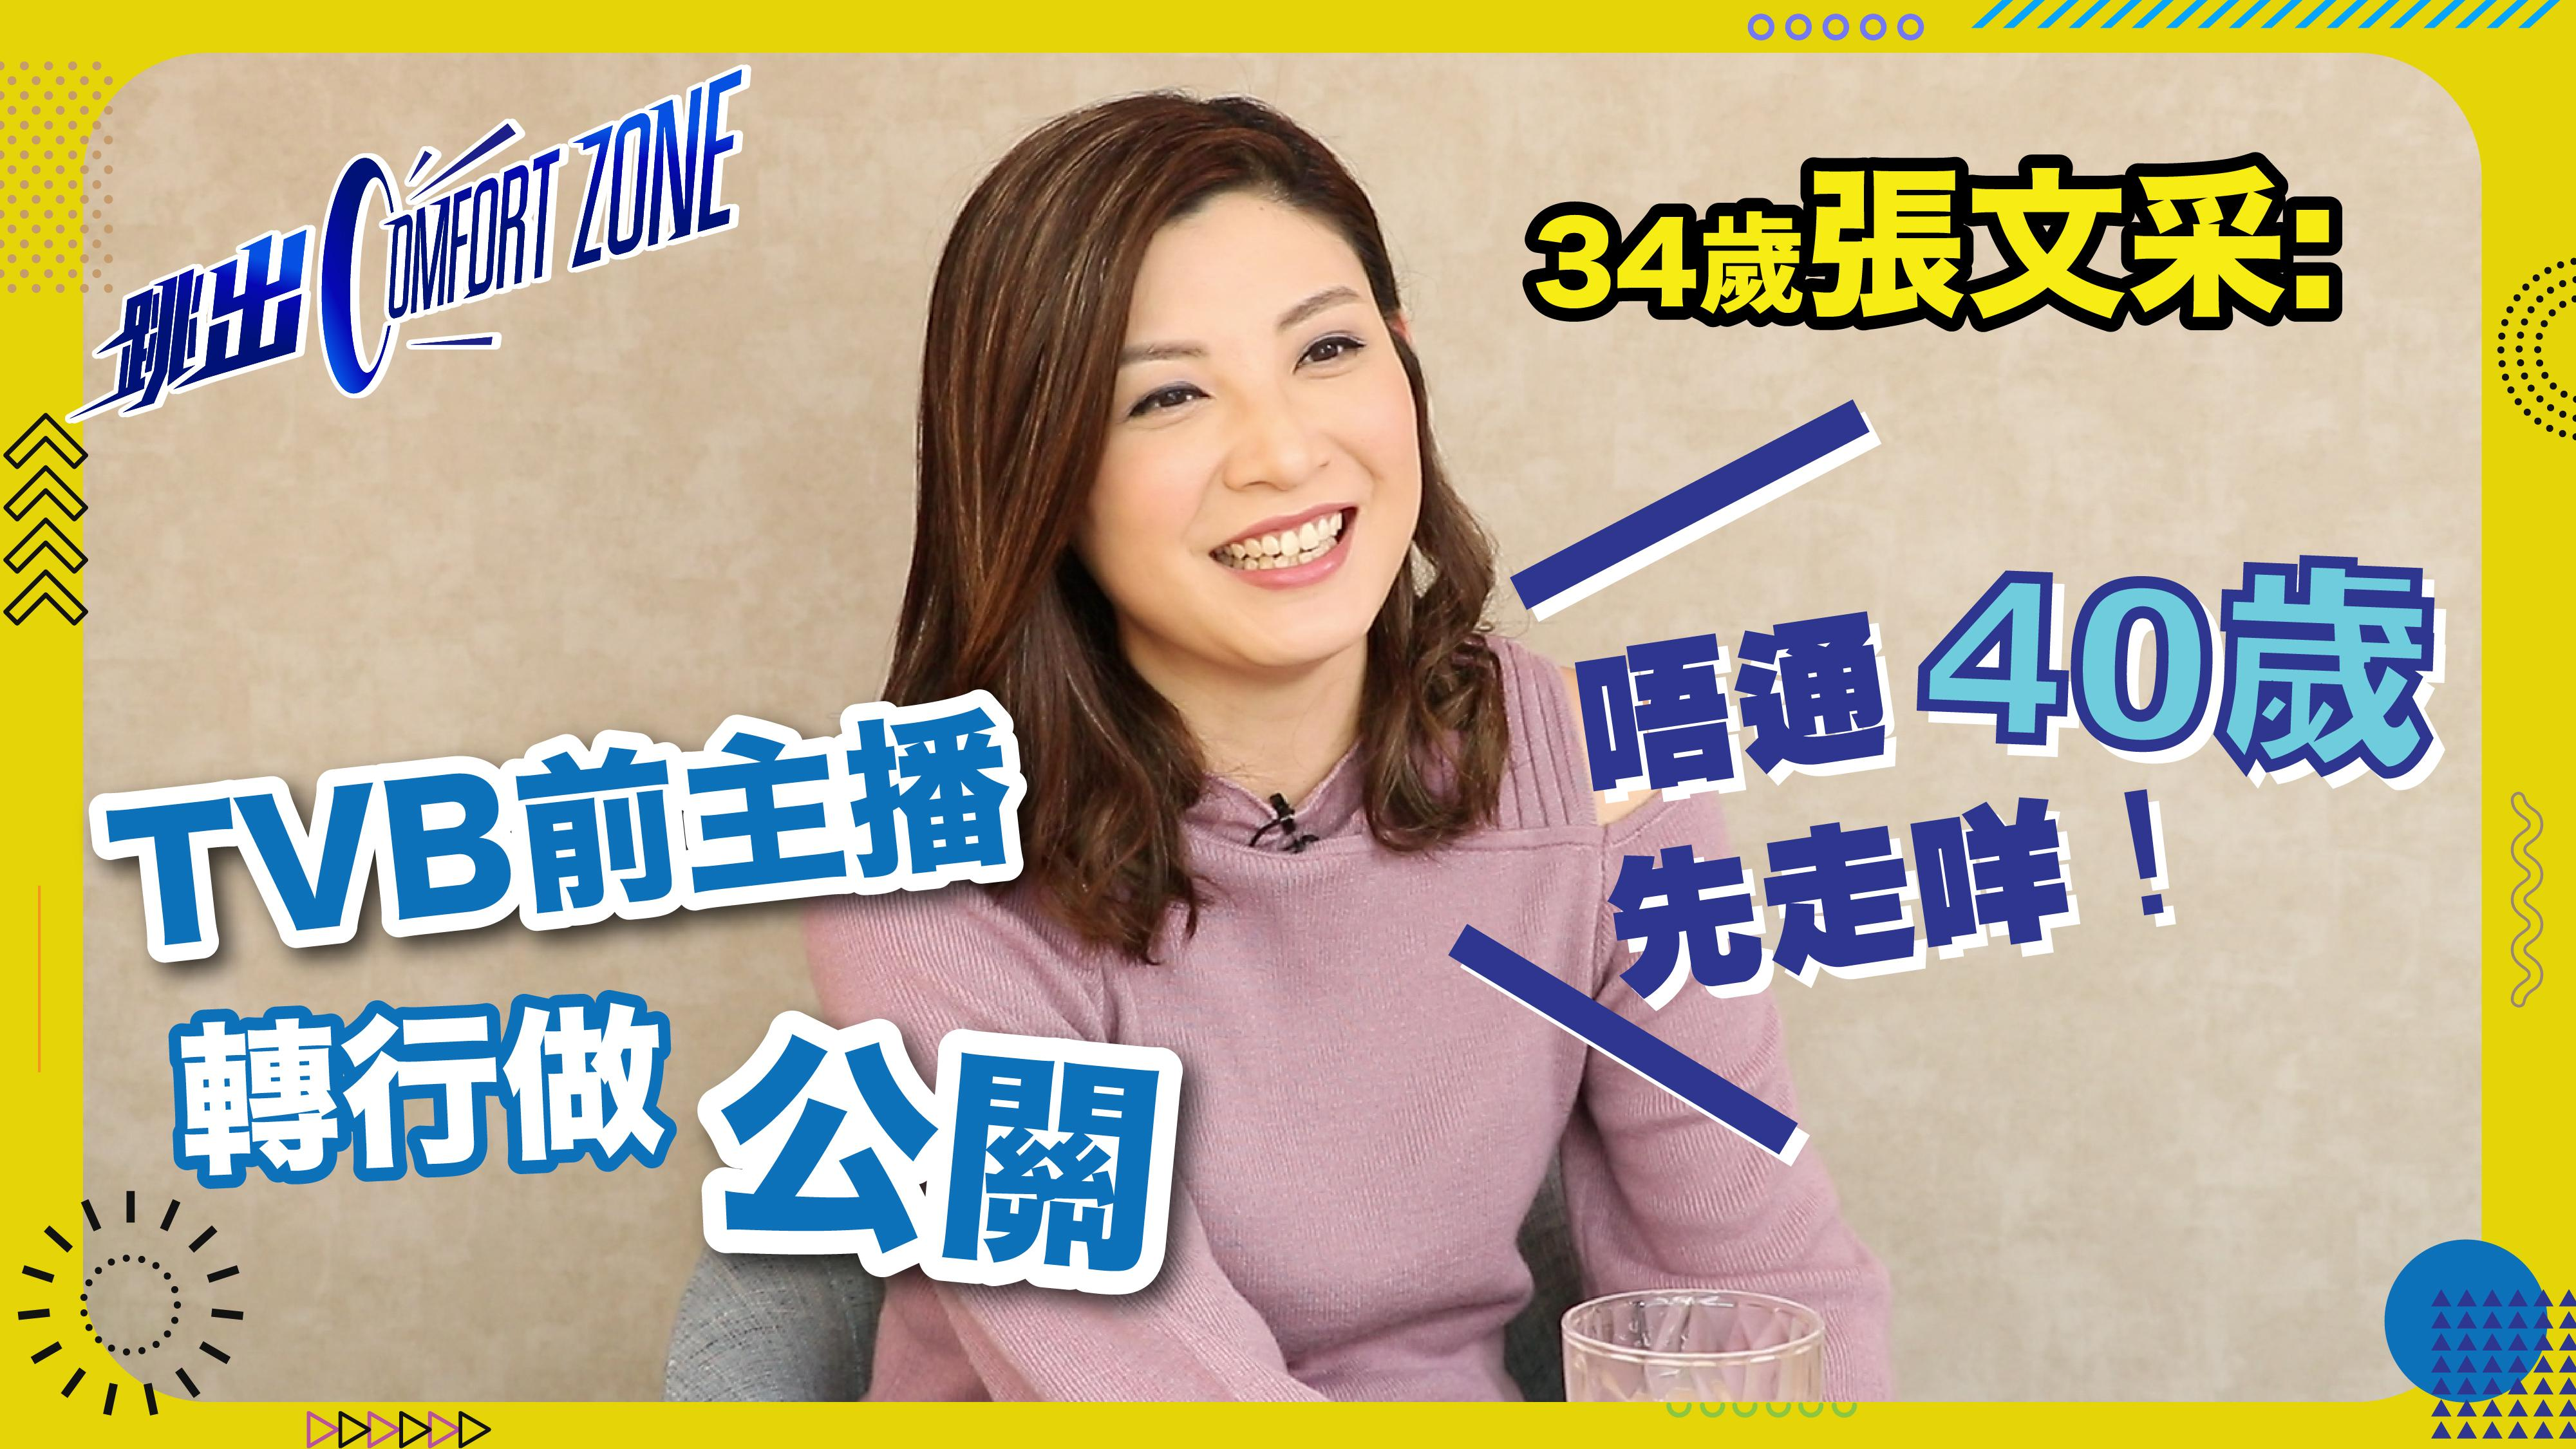 TVB前主播轉行做公關 張文采:唔通40歲先走咩?【跳出ComfortZone】